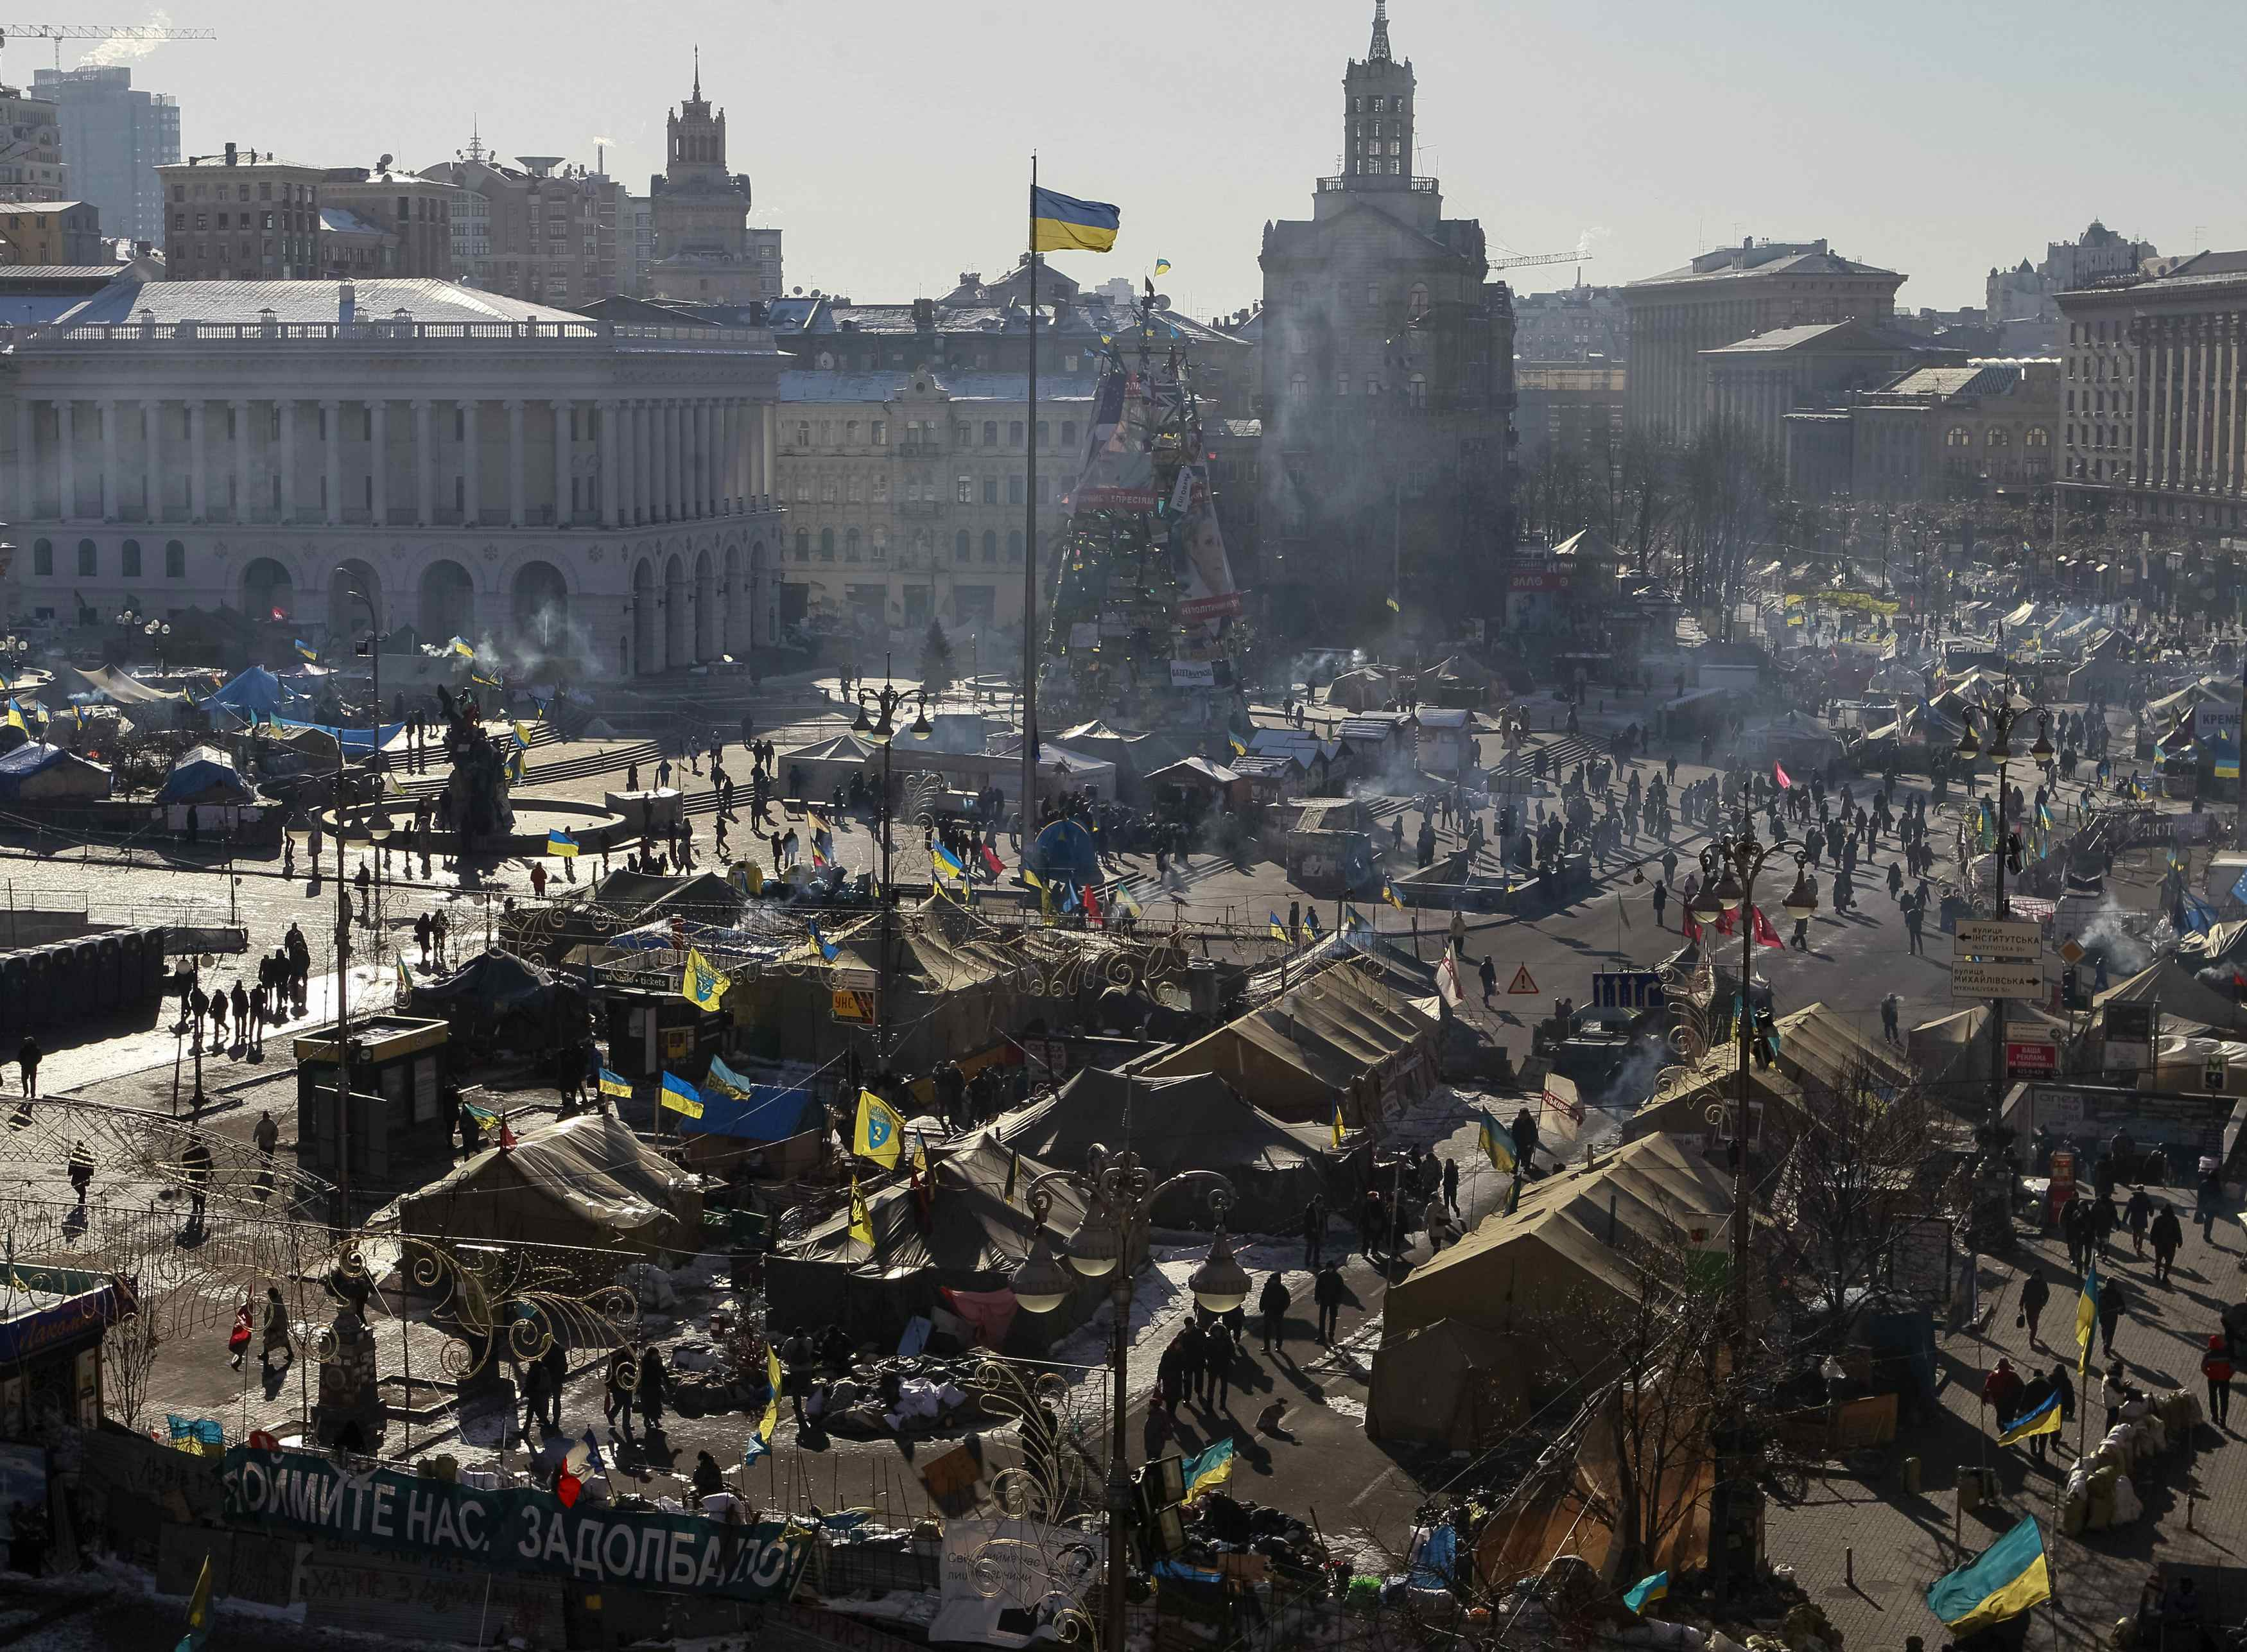 Кто пришел разбирать баррикады Майдана: видео